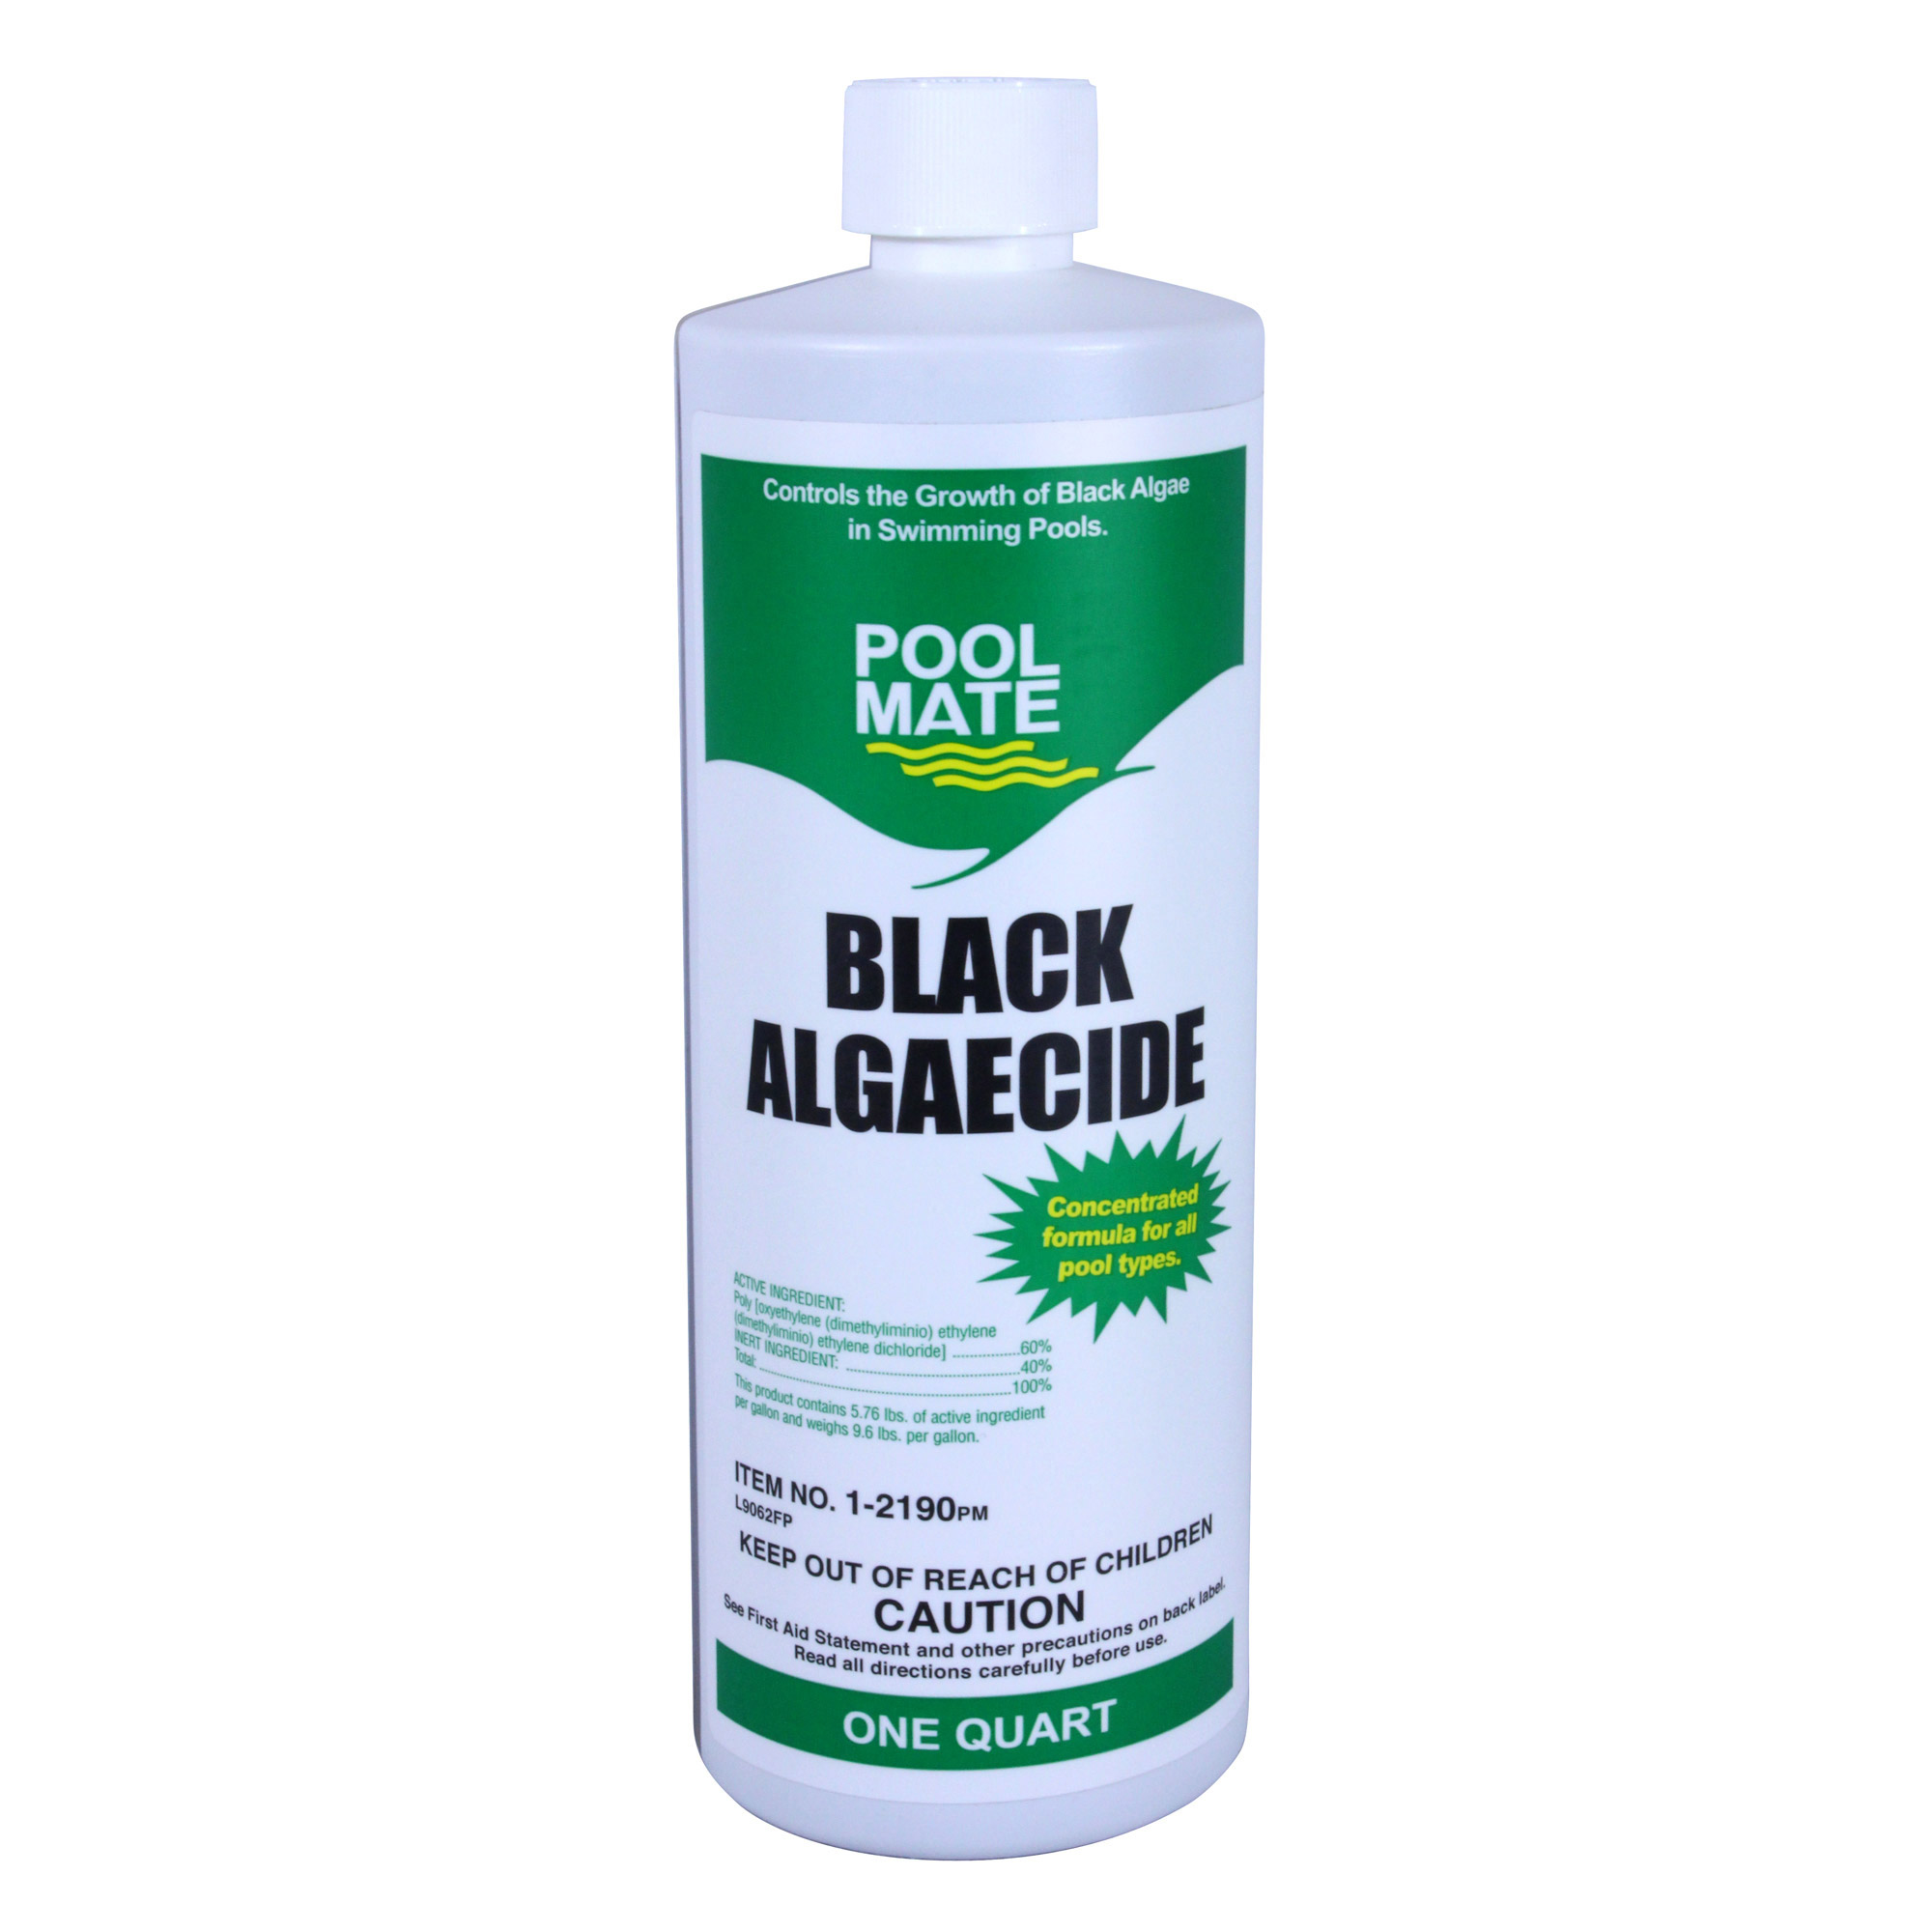 Pool mate black algae swimming pool non foaming non metallic algaecide 60 4 qt ebay for Using algaecide in swimming pool